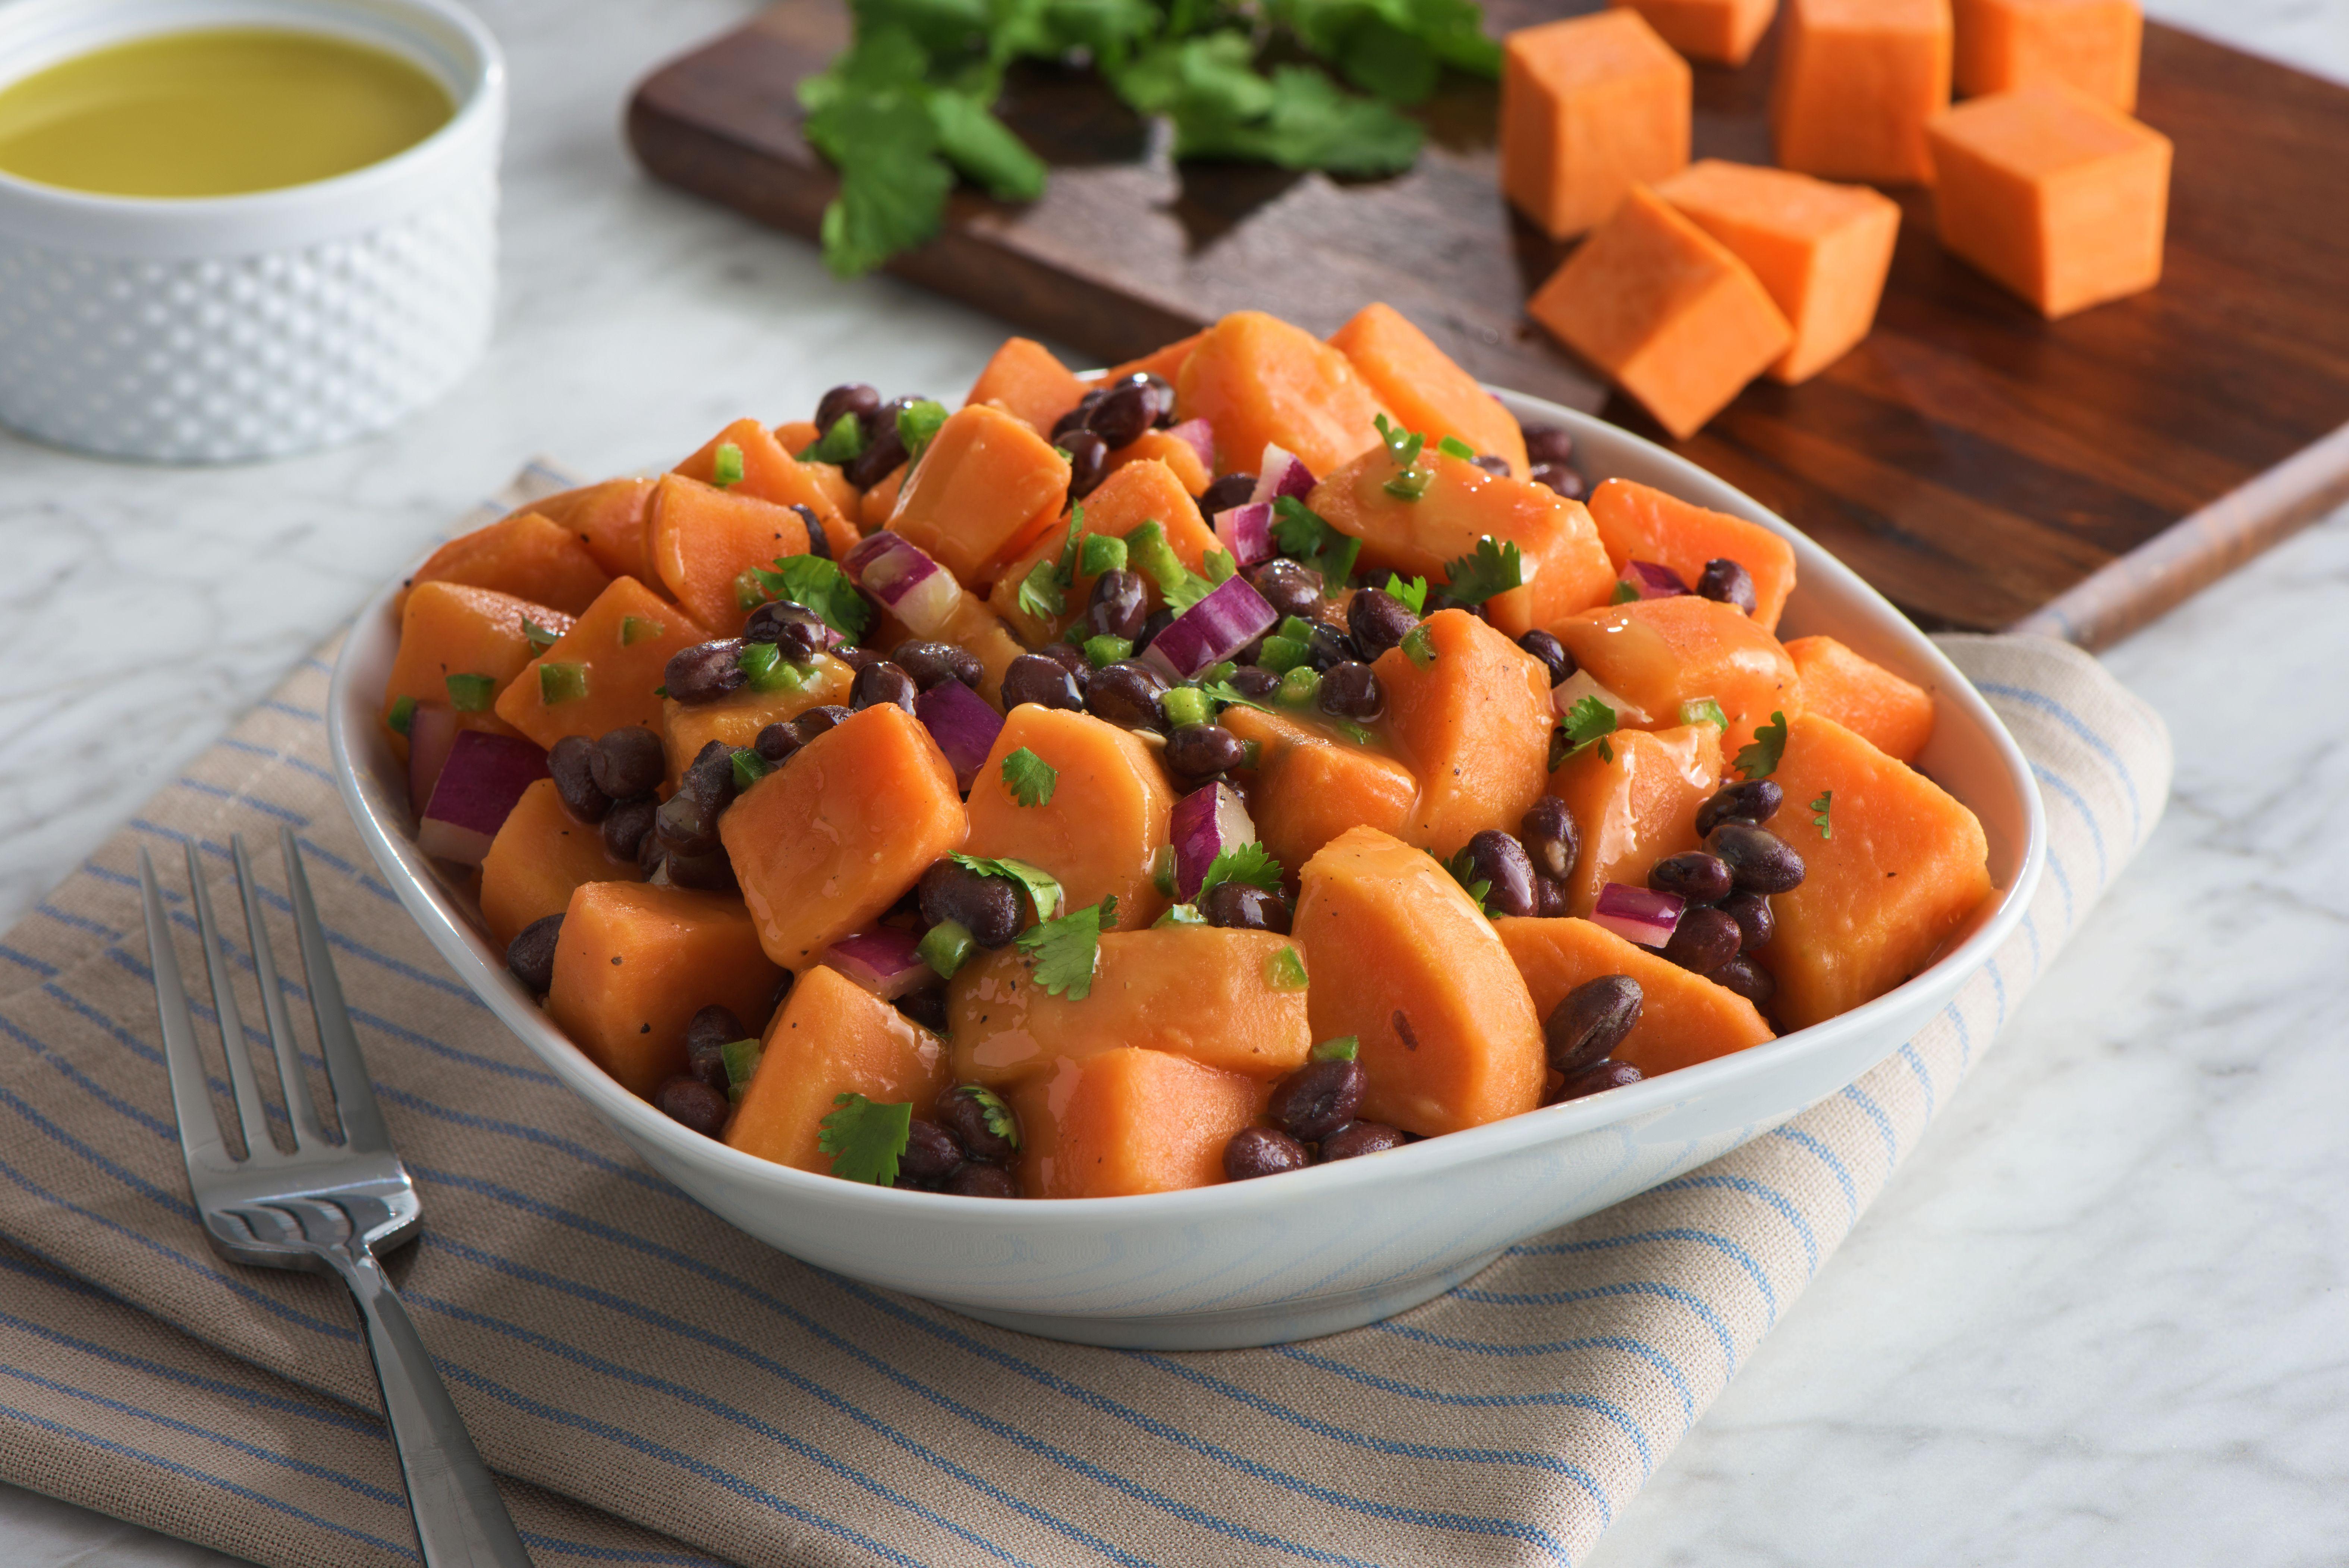 Sweet Potato And Black Bean Salad Recipe Glorious Vegetables Pinterest Large Bowl Lime Juice Beans